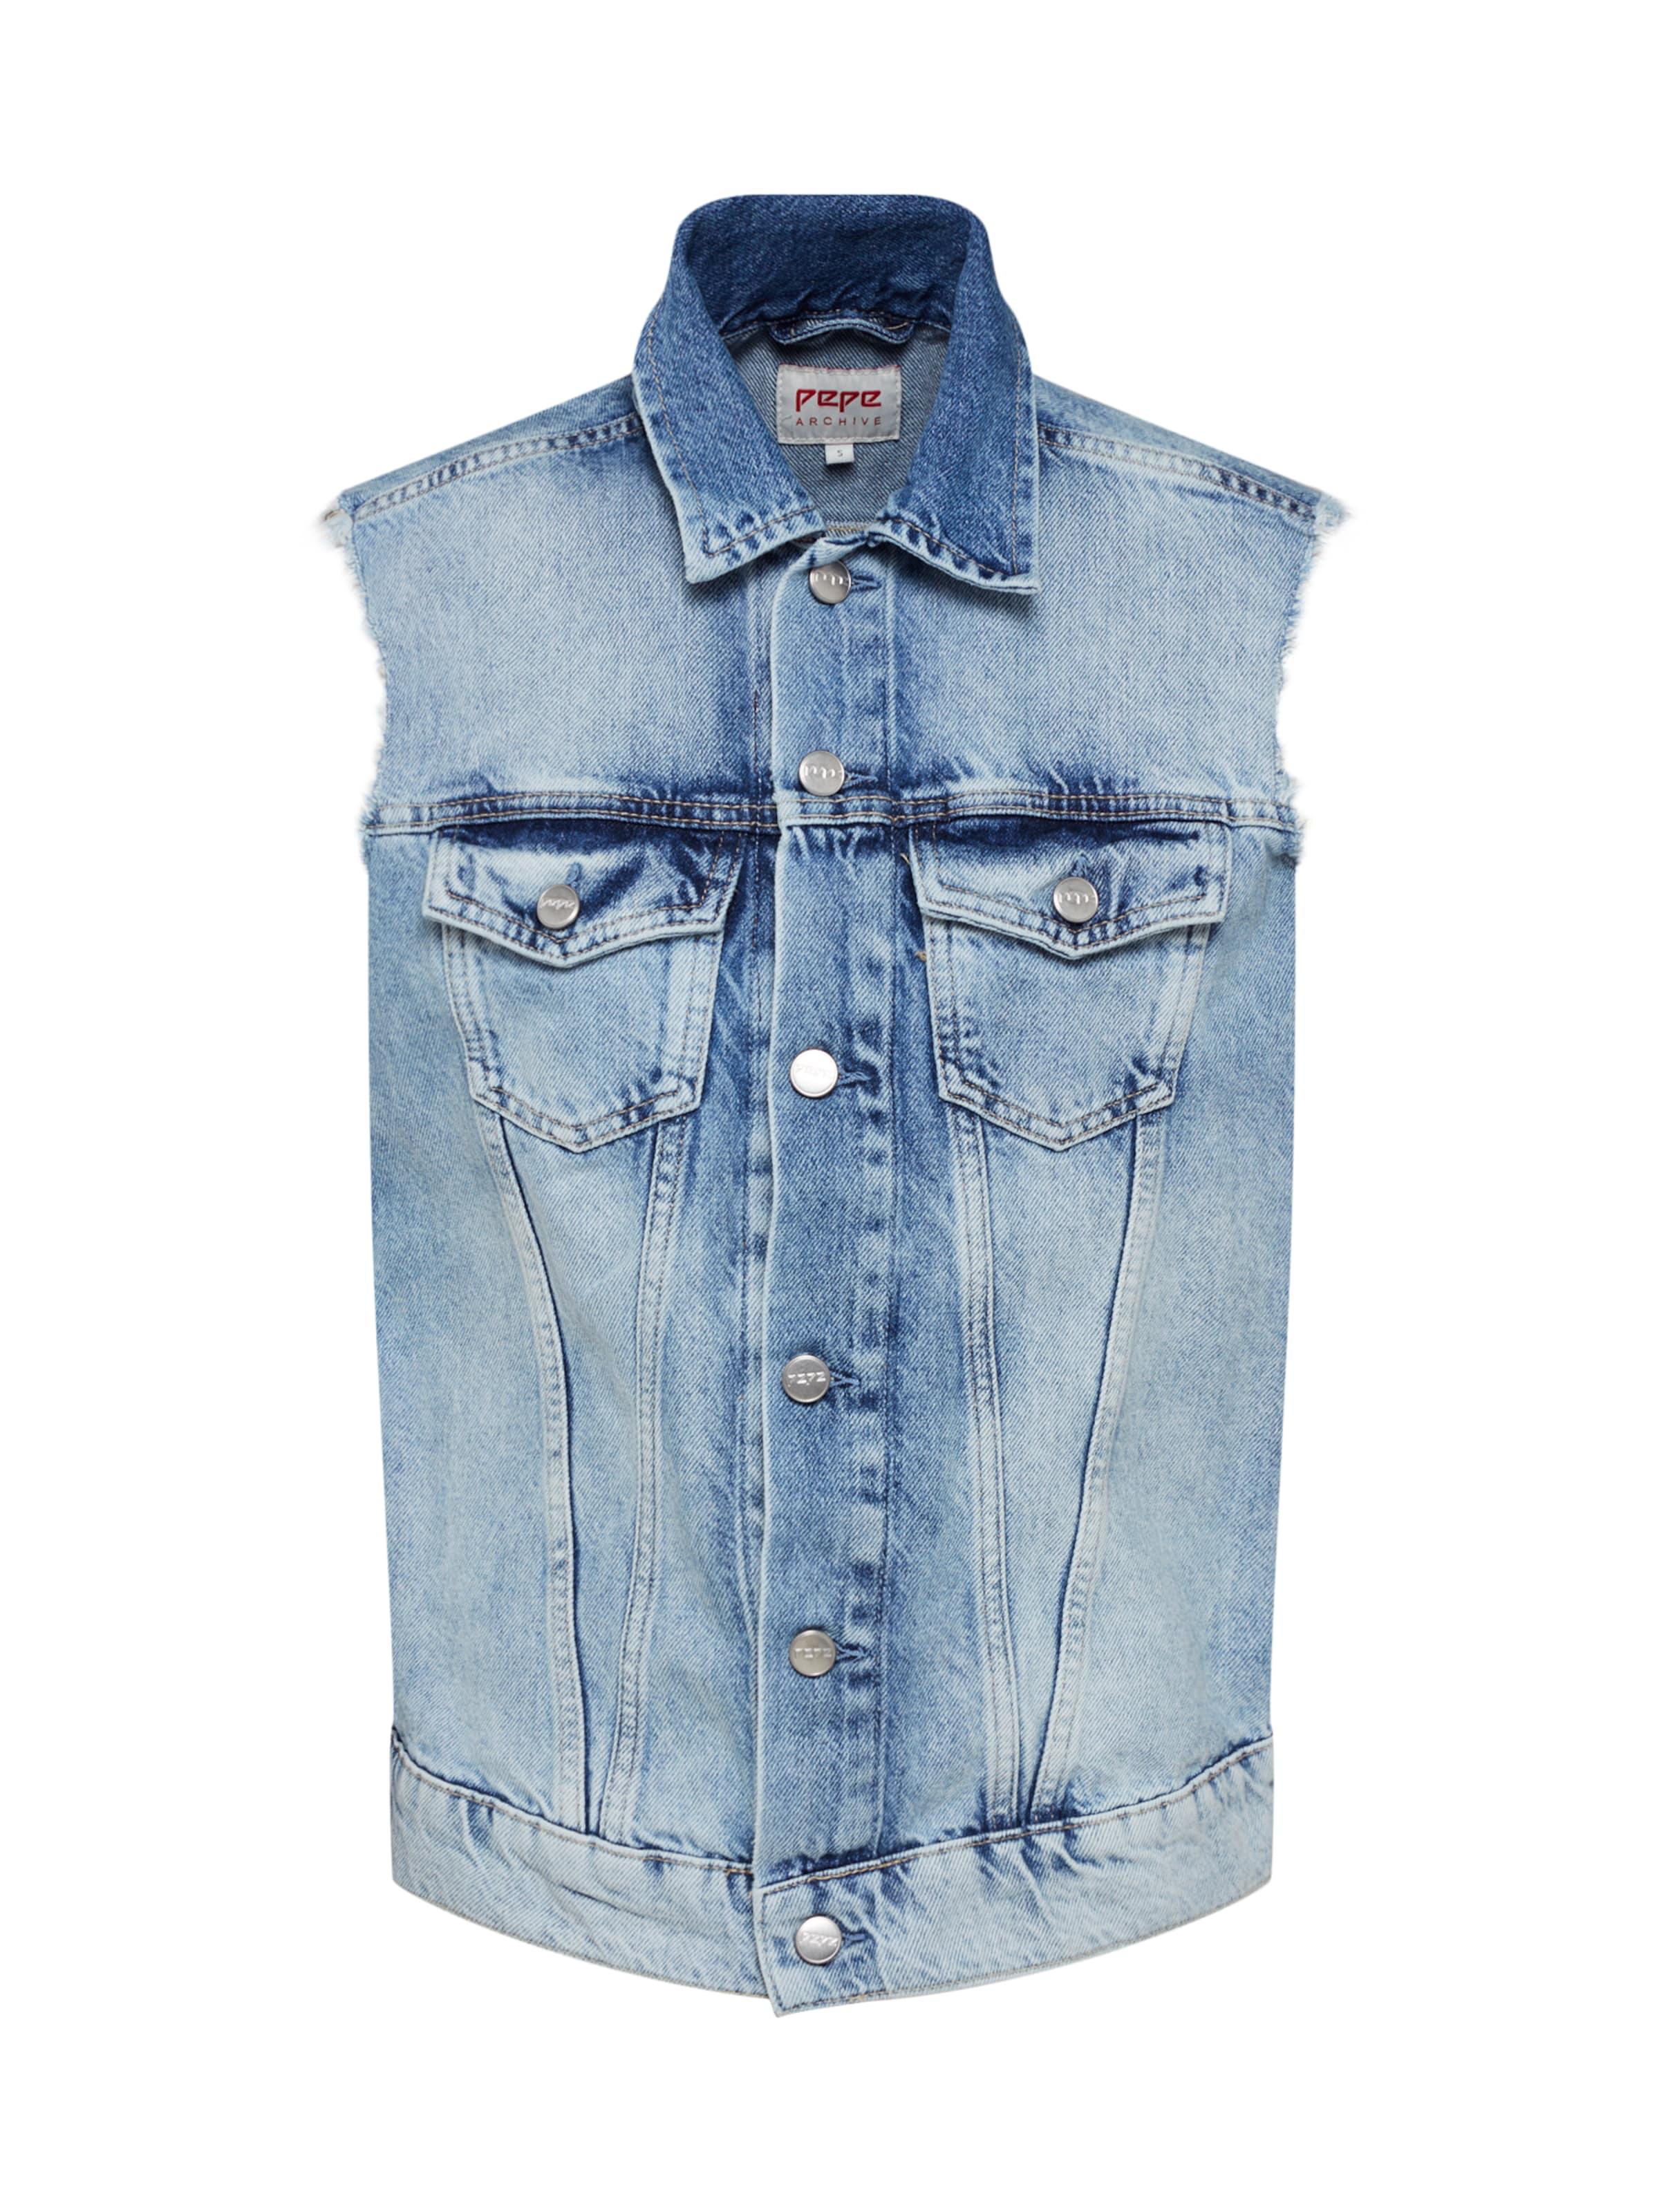 Jeans Pepe Denim 'maria' Blue Weste In Ib9eDHEYW2